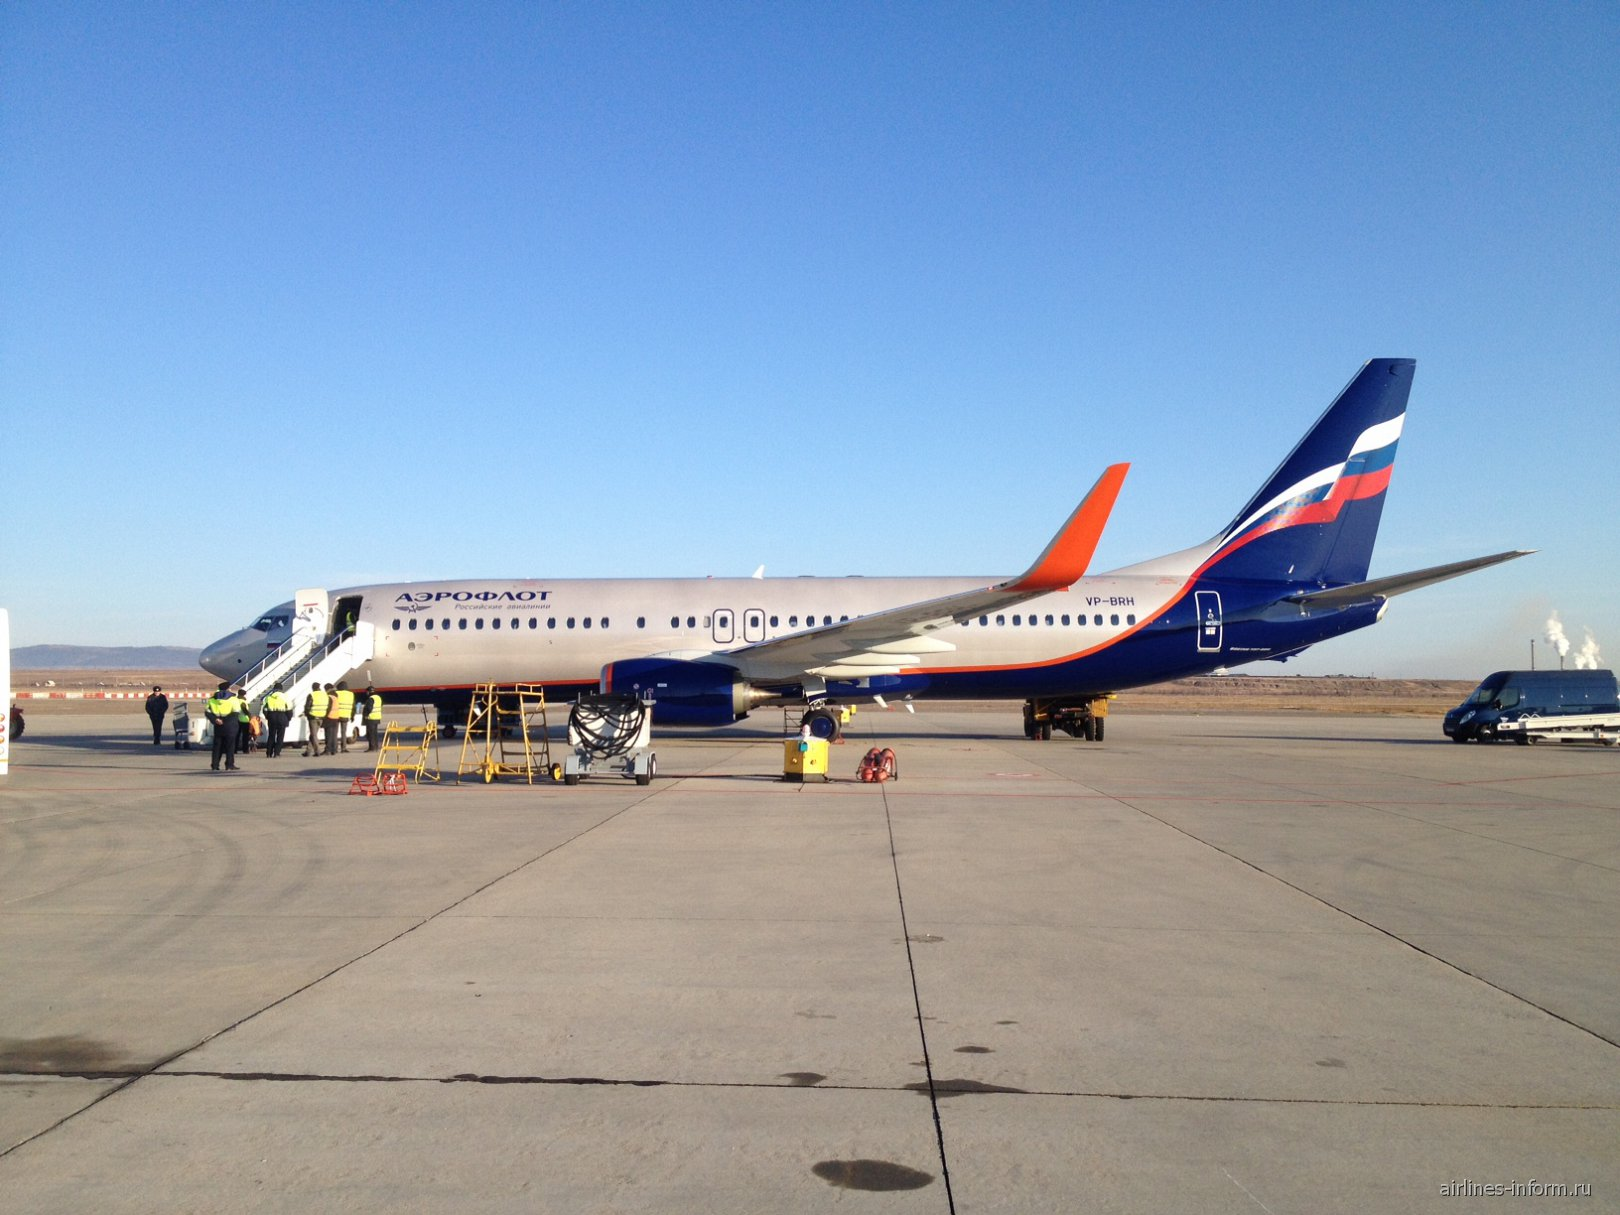 "Боинг-737-800 VP-BRH ""Кустодиев"" авиакомпании Аэрофлот в аэропорту Читы"